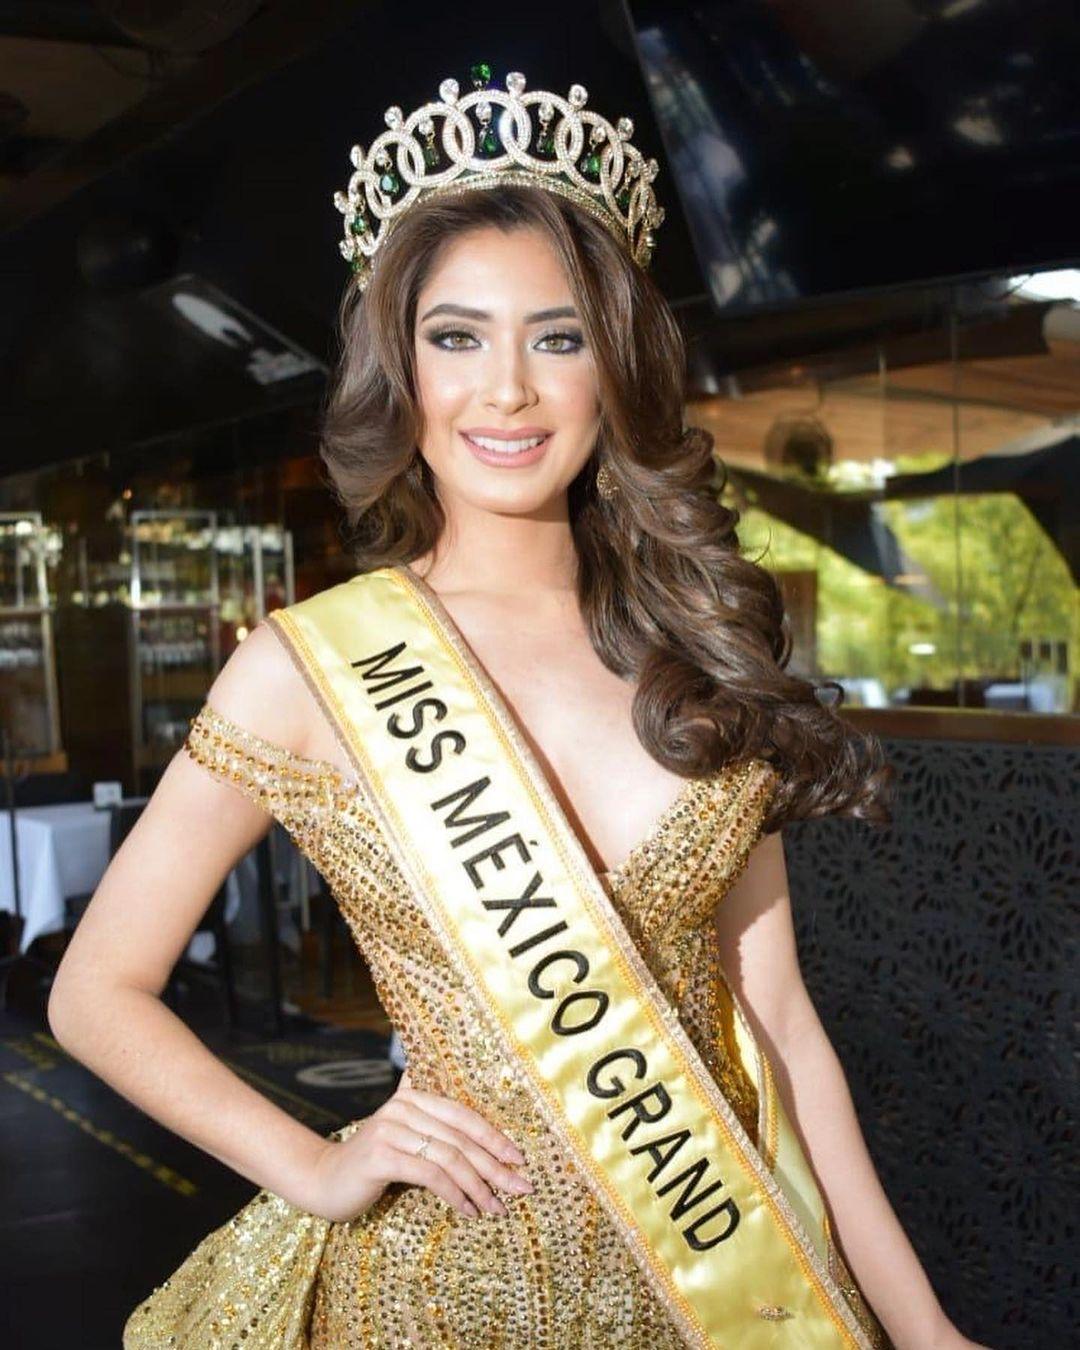 angela leon yuriar, top 21 de miss grand international 2020. - Página 11 Yocrk10